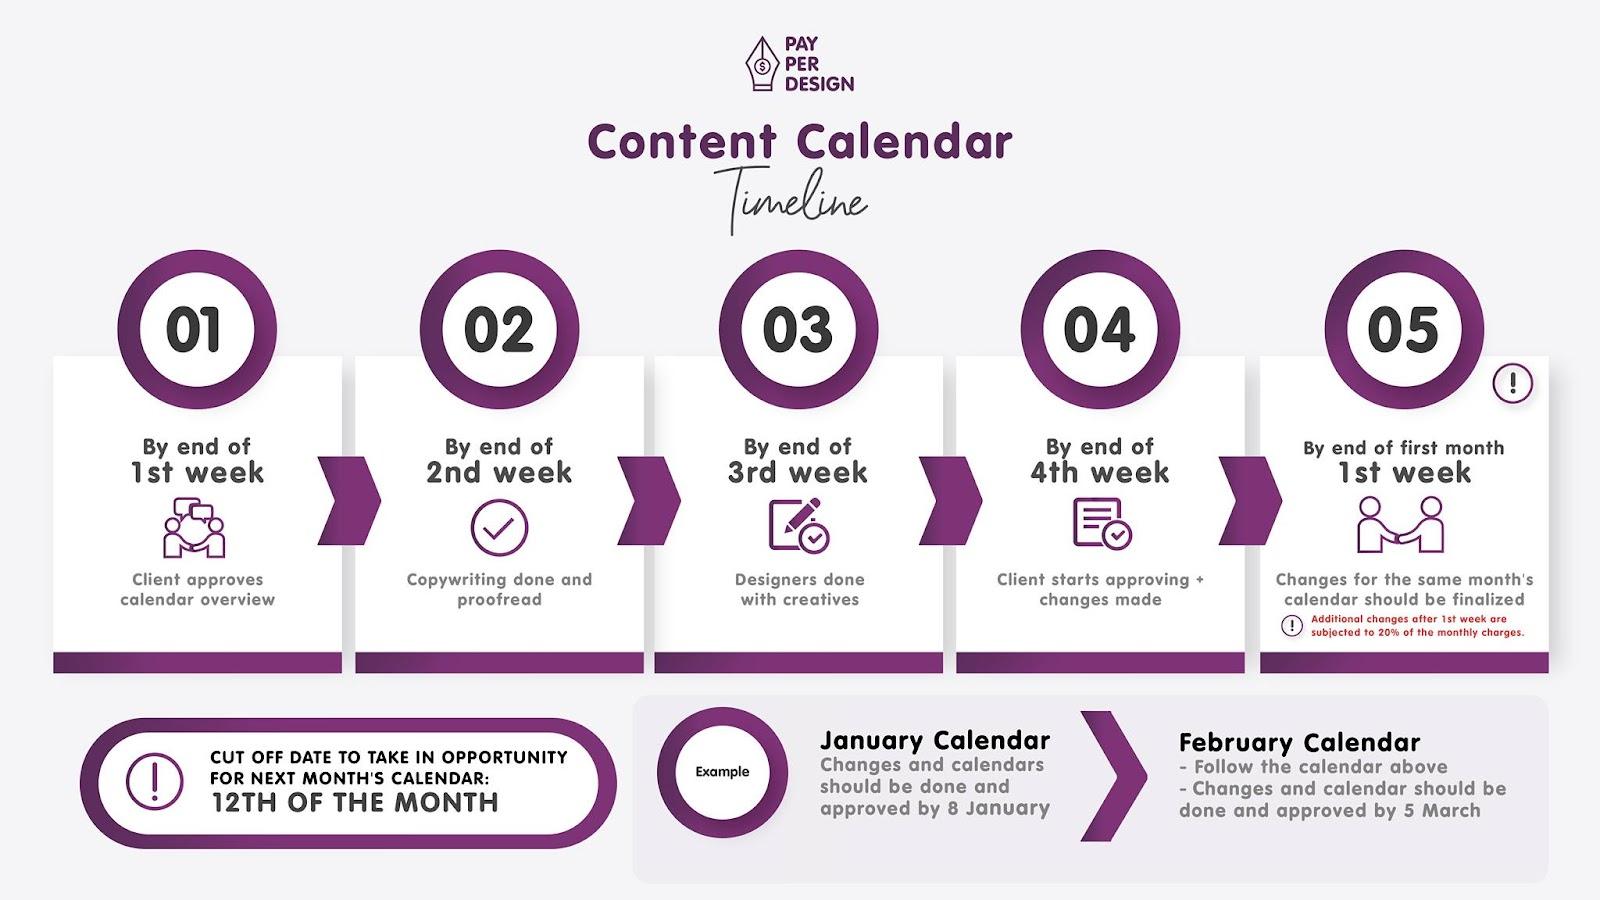 Content Calendar Timeline